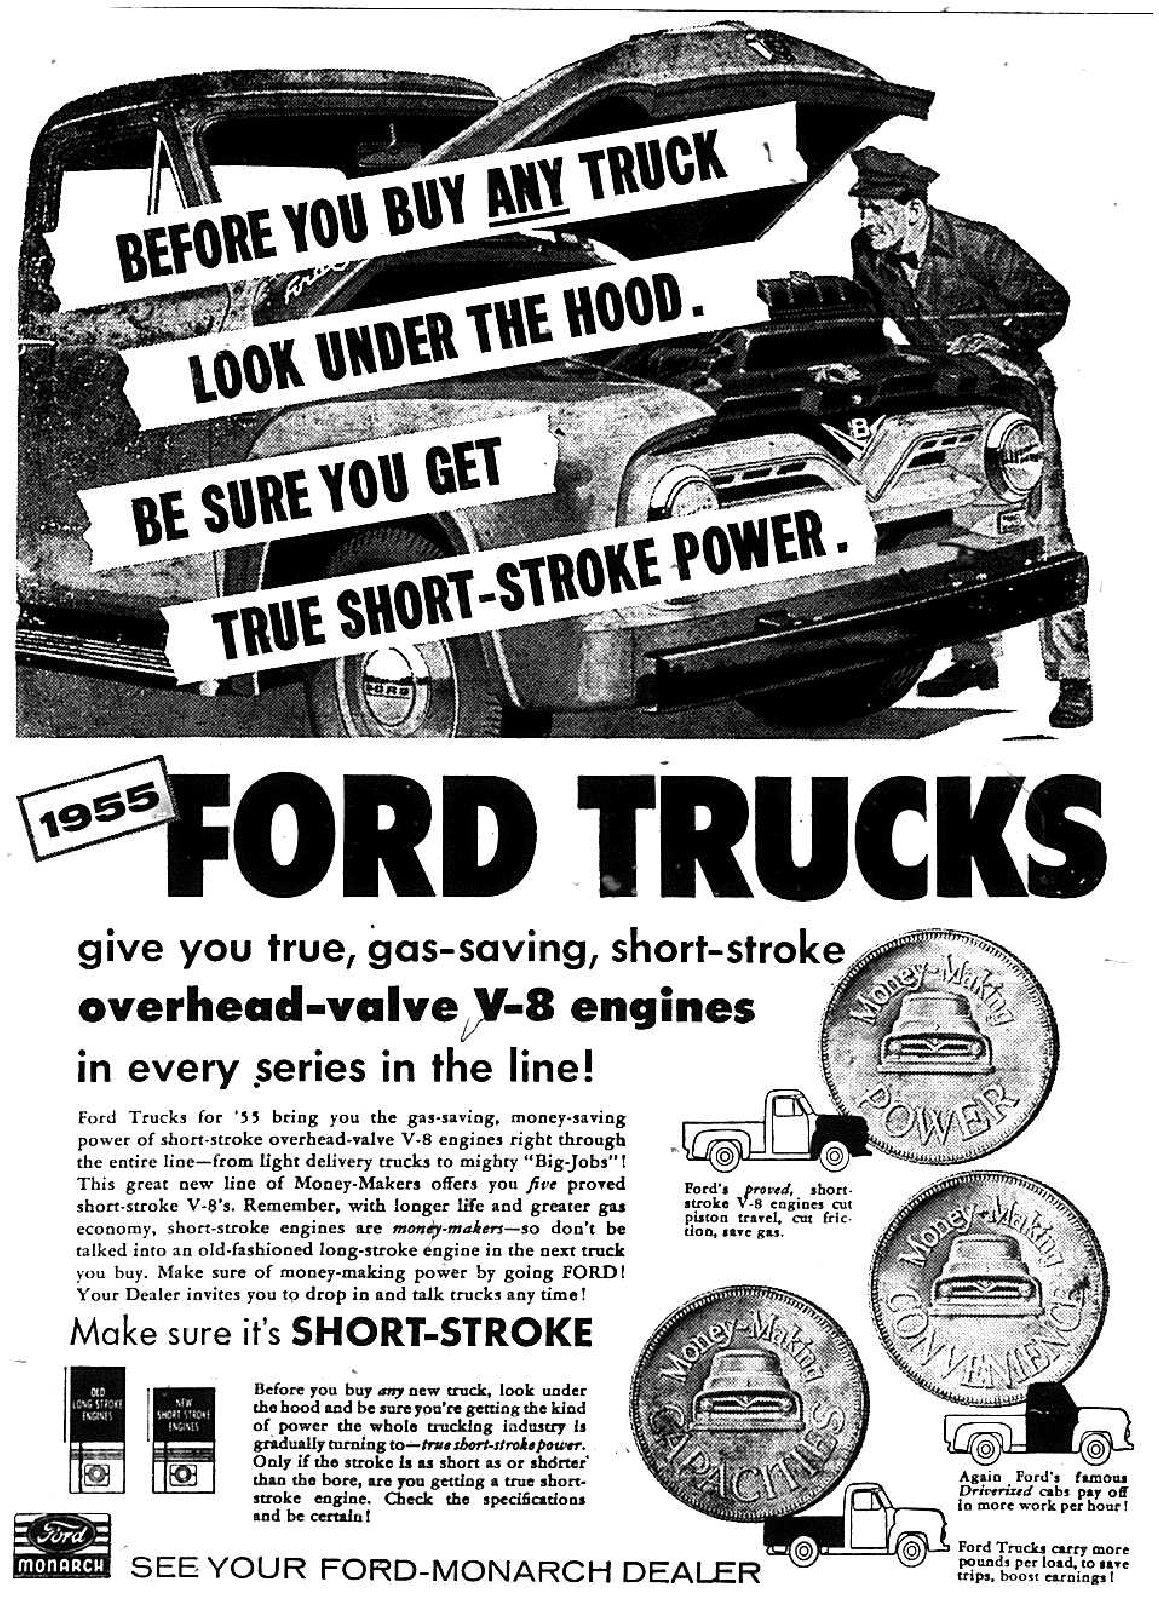 Ford Trucks Advertisement, 1955